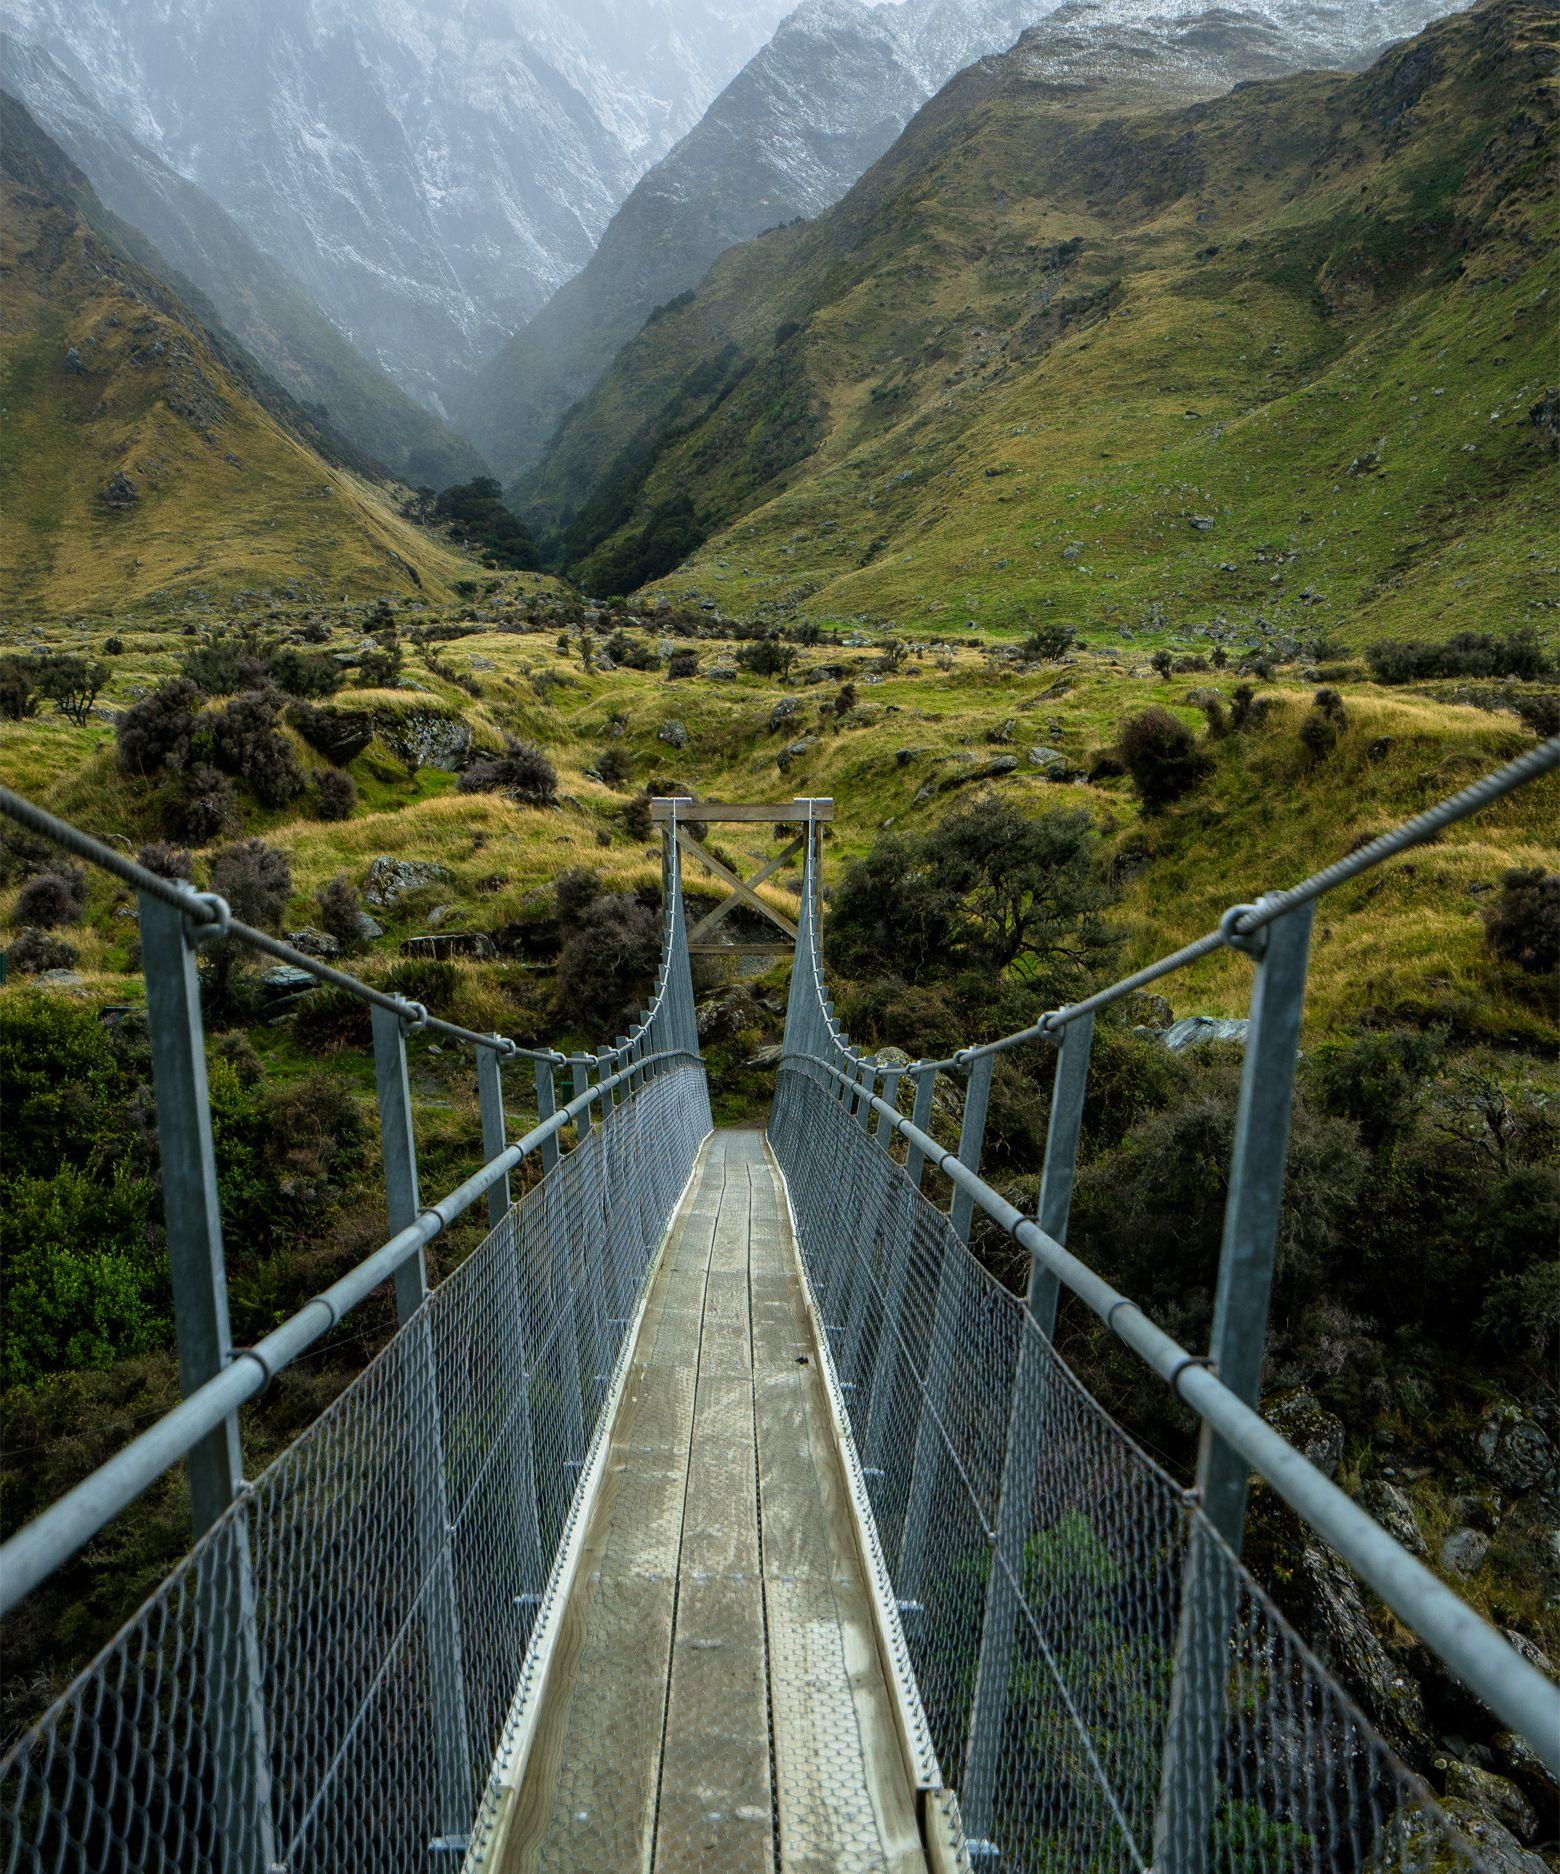 Best 25+ Wanaka new zealand ideas on Pinterest   New zealand mountains, New zealand and Blue ...